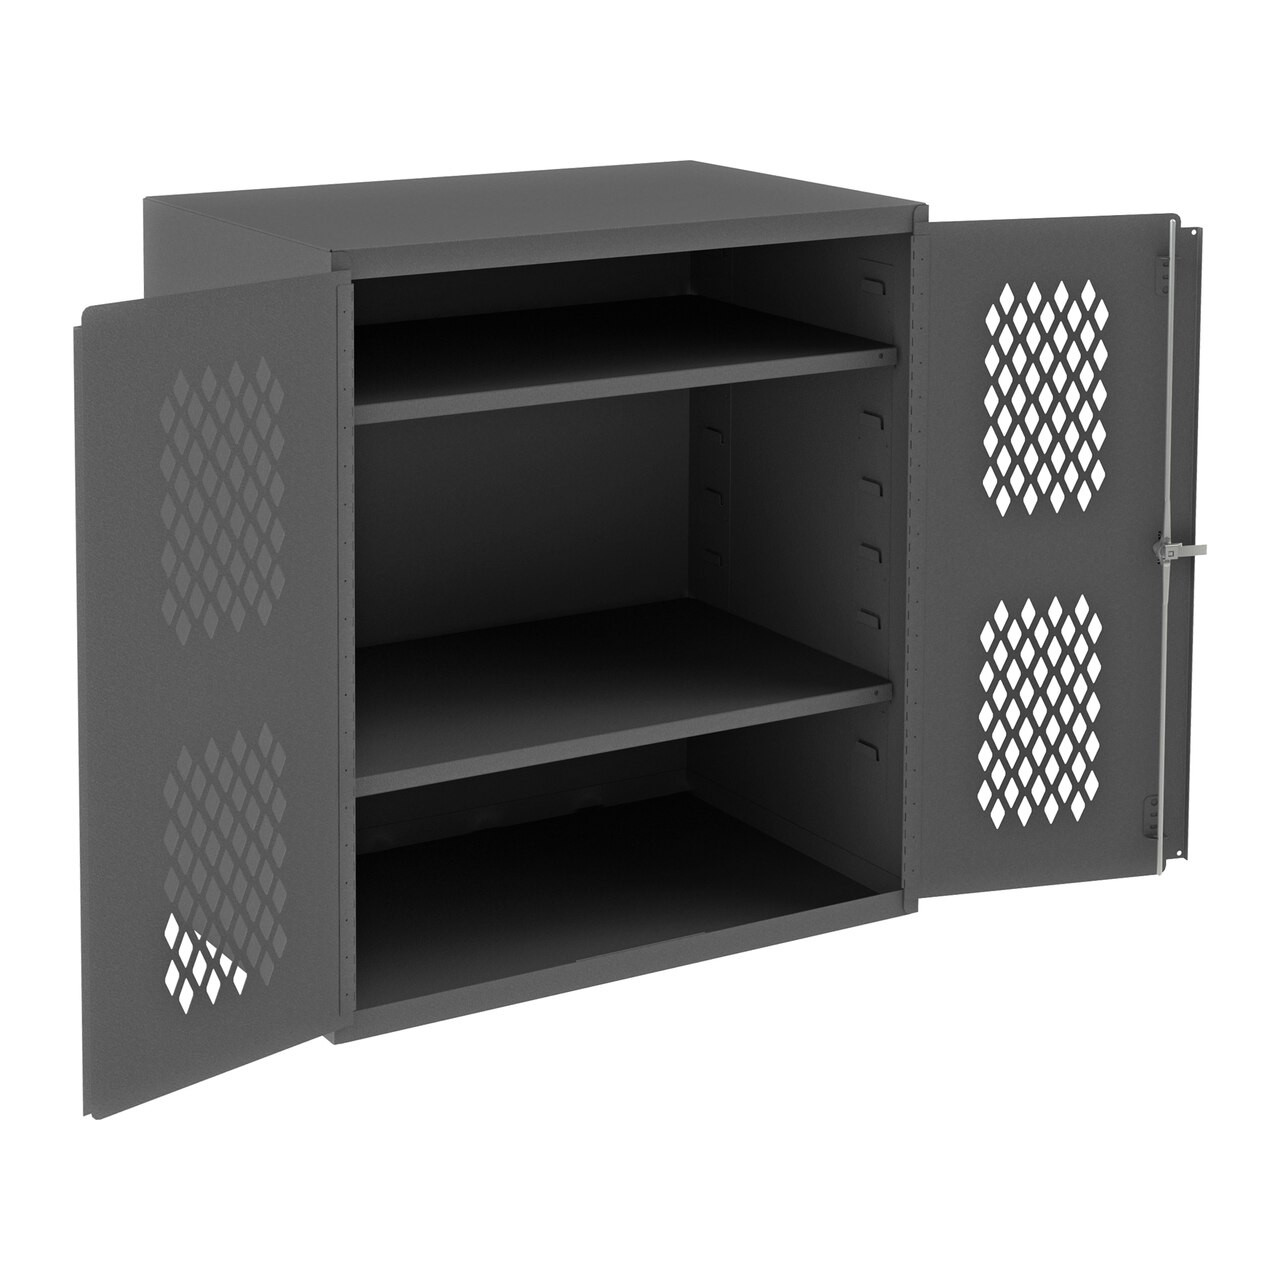 "DURHAM HD Ventilated Storage Cabinet, Gray, 42"" H X 36"" W X 24"" D"